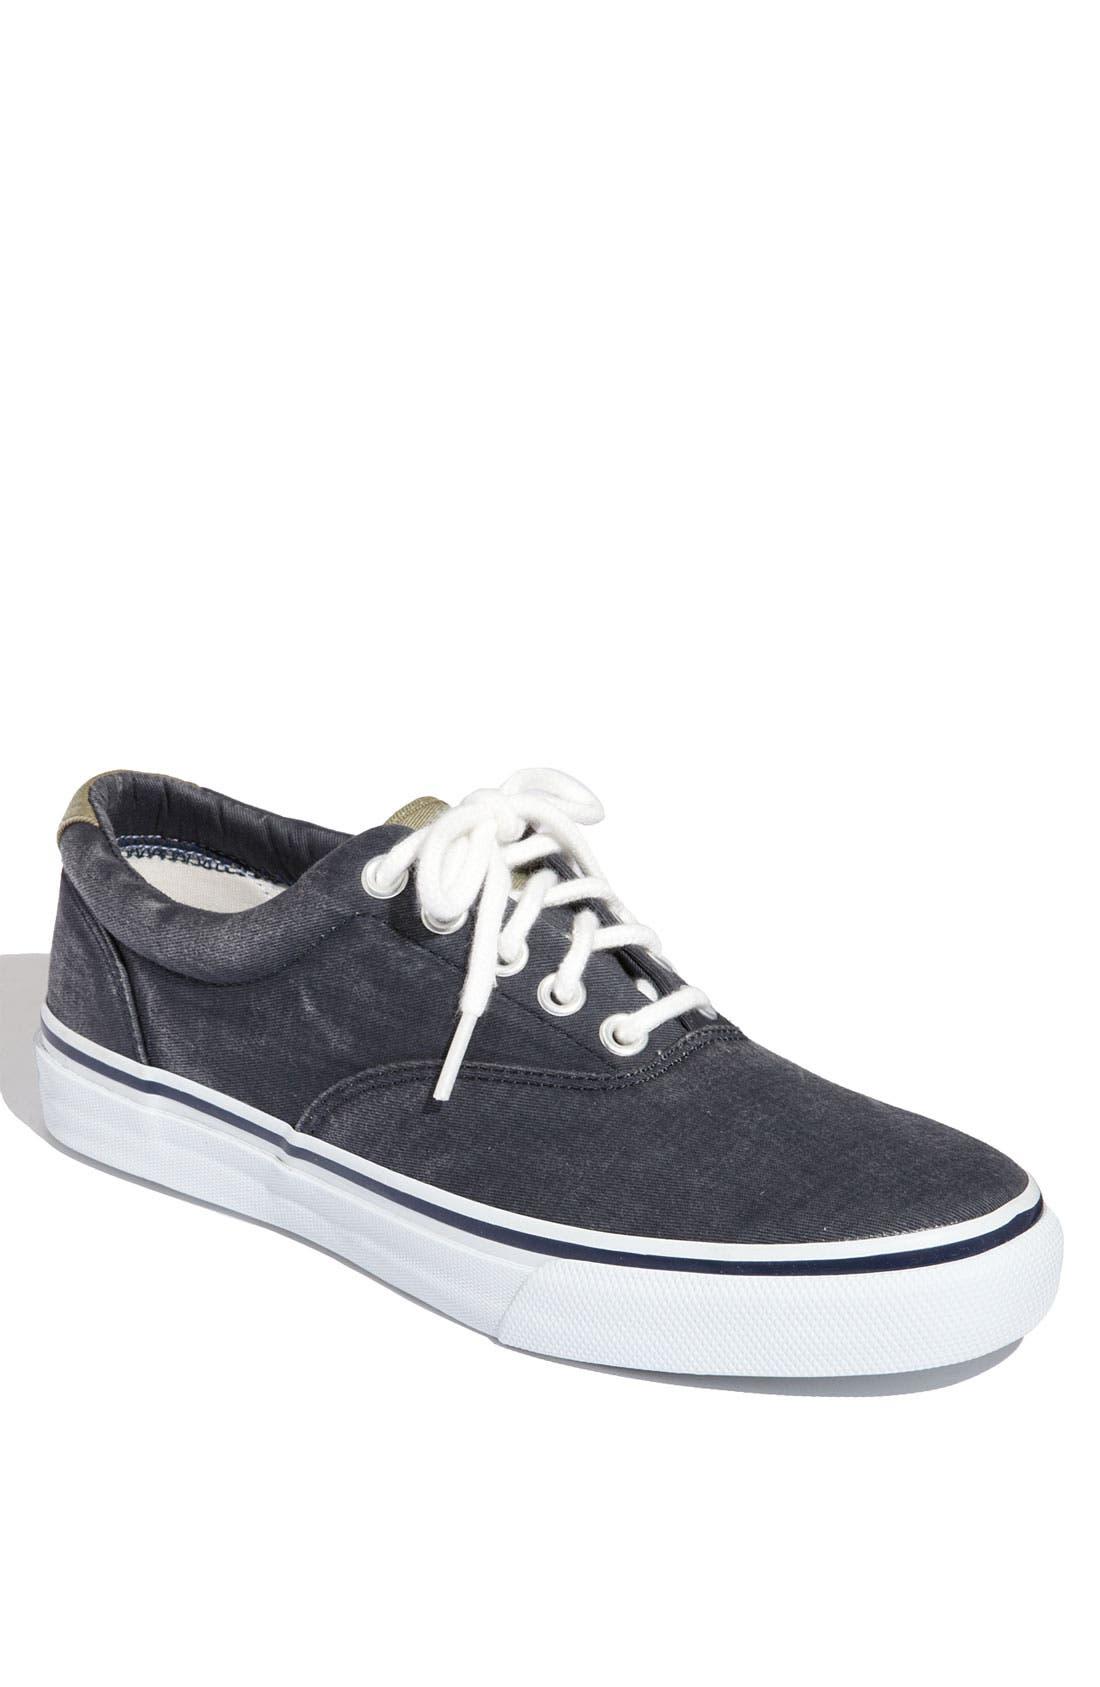 Main Image - Sperry Top-Sider® 'Striper' Sneaker (Men)